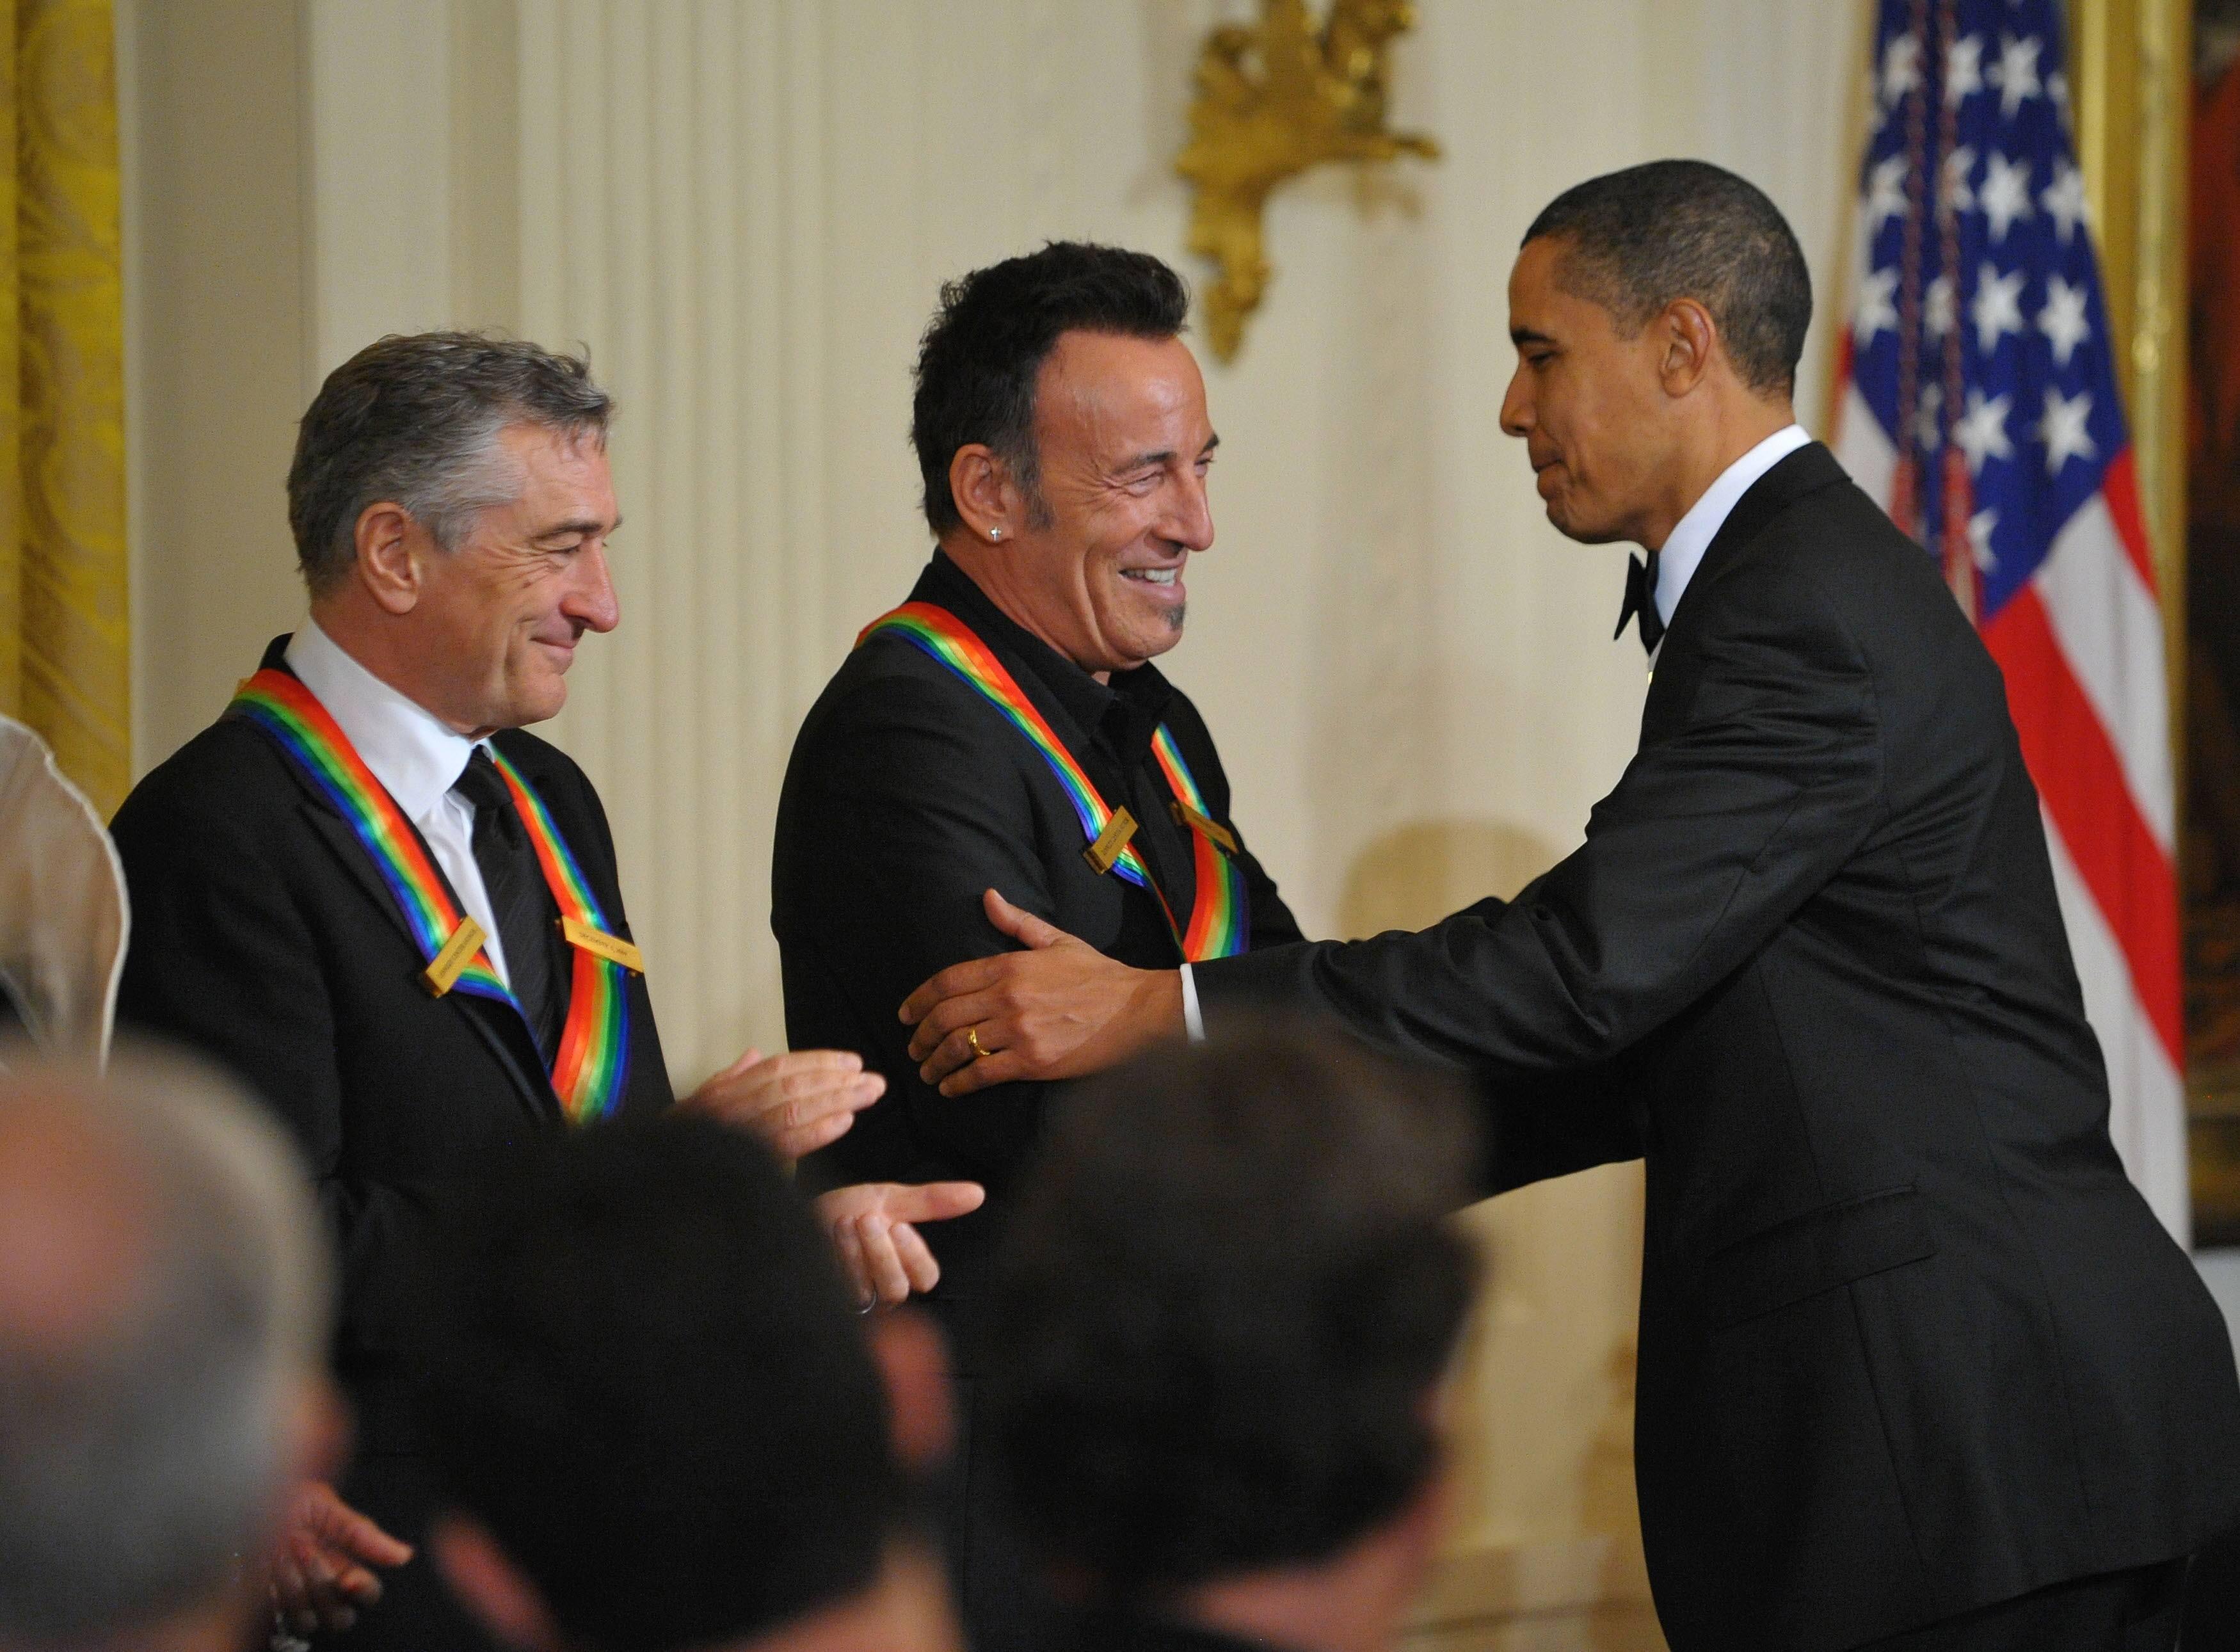 Robert De Niro, Bruce Springsteen, Barack Obama 2009 Kennedy Center Honors